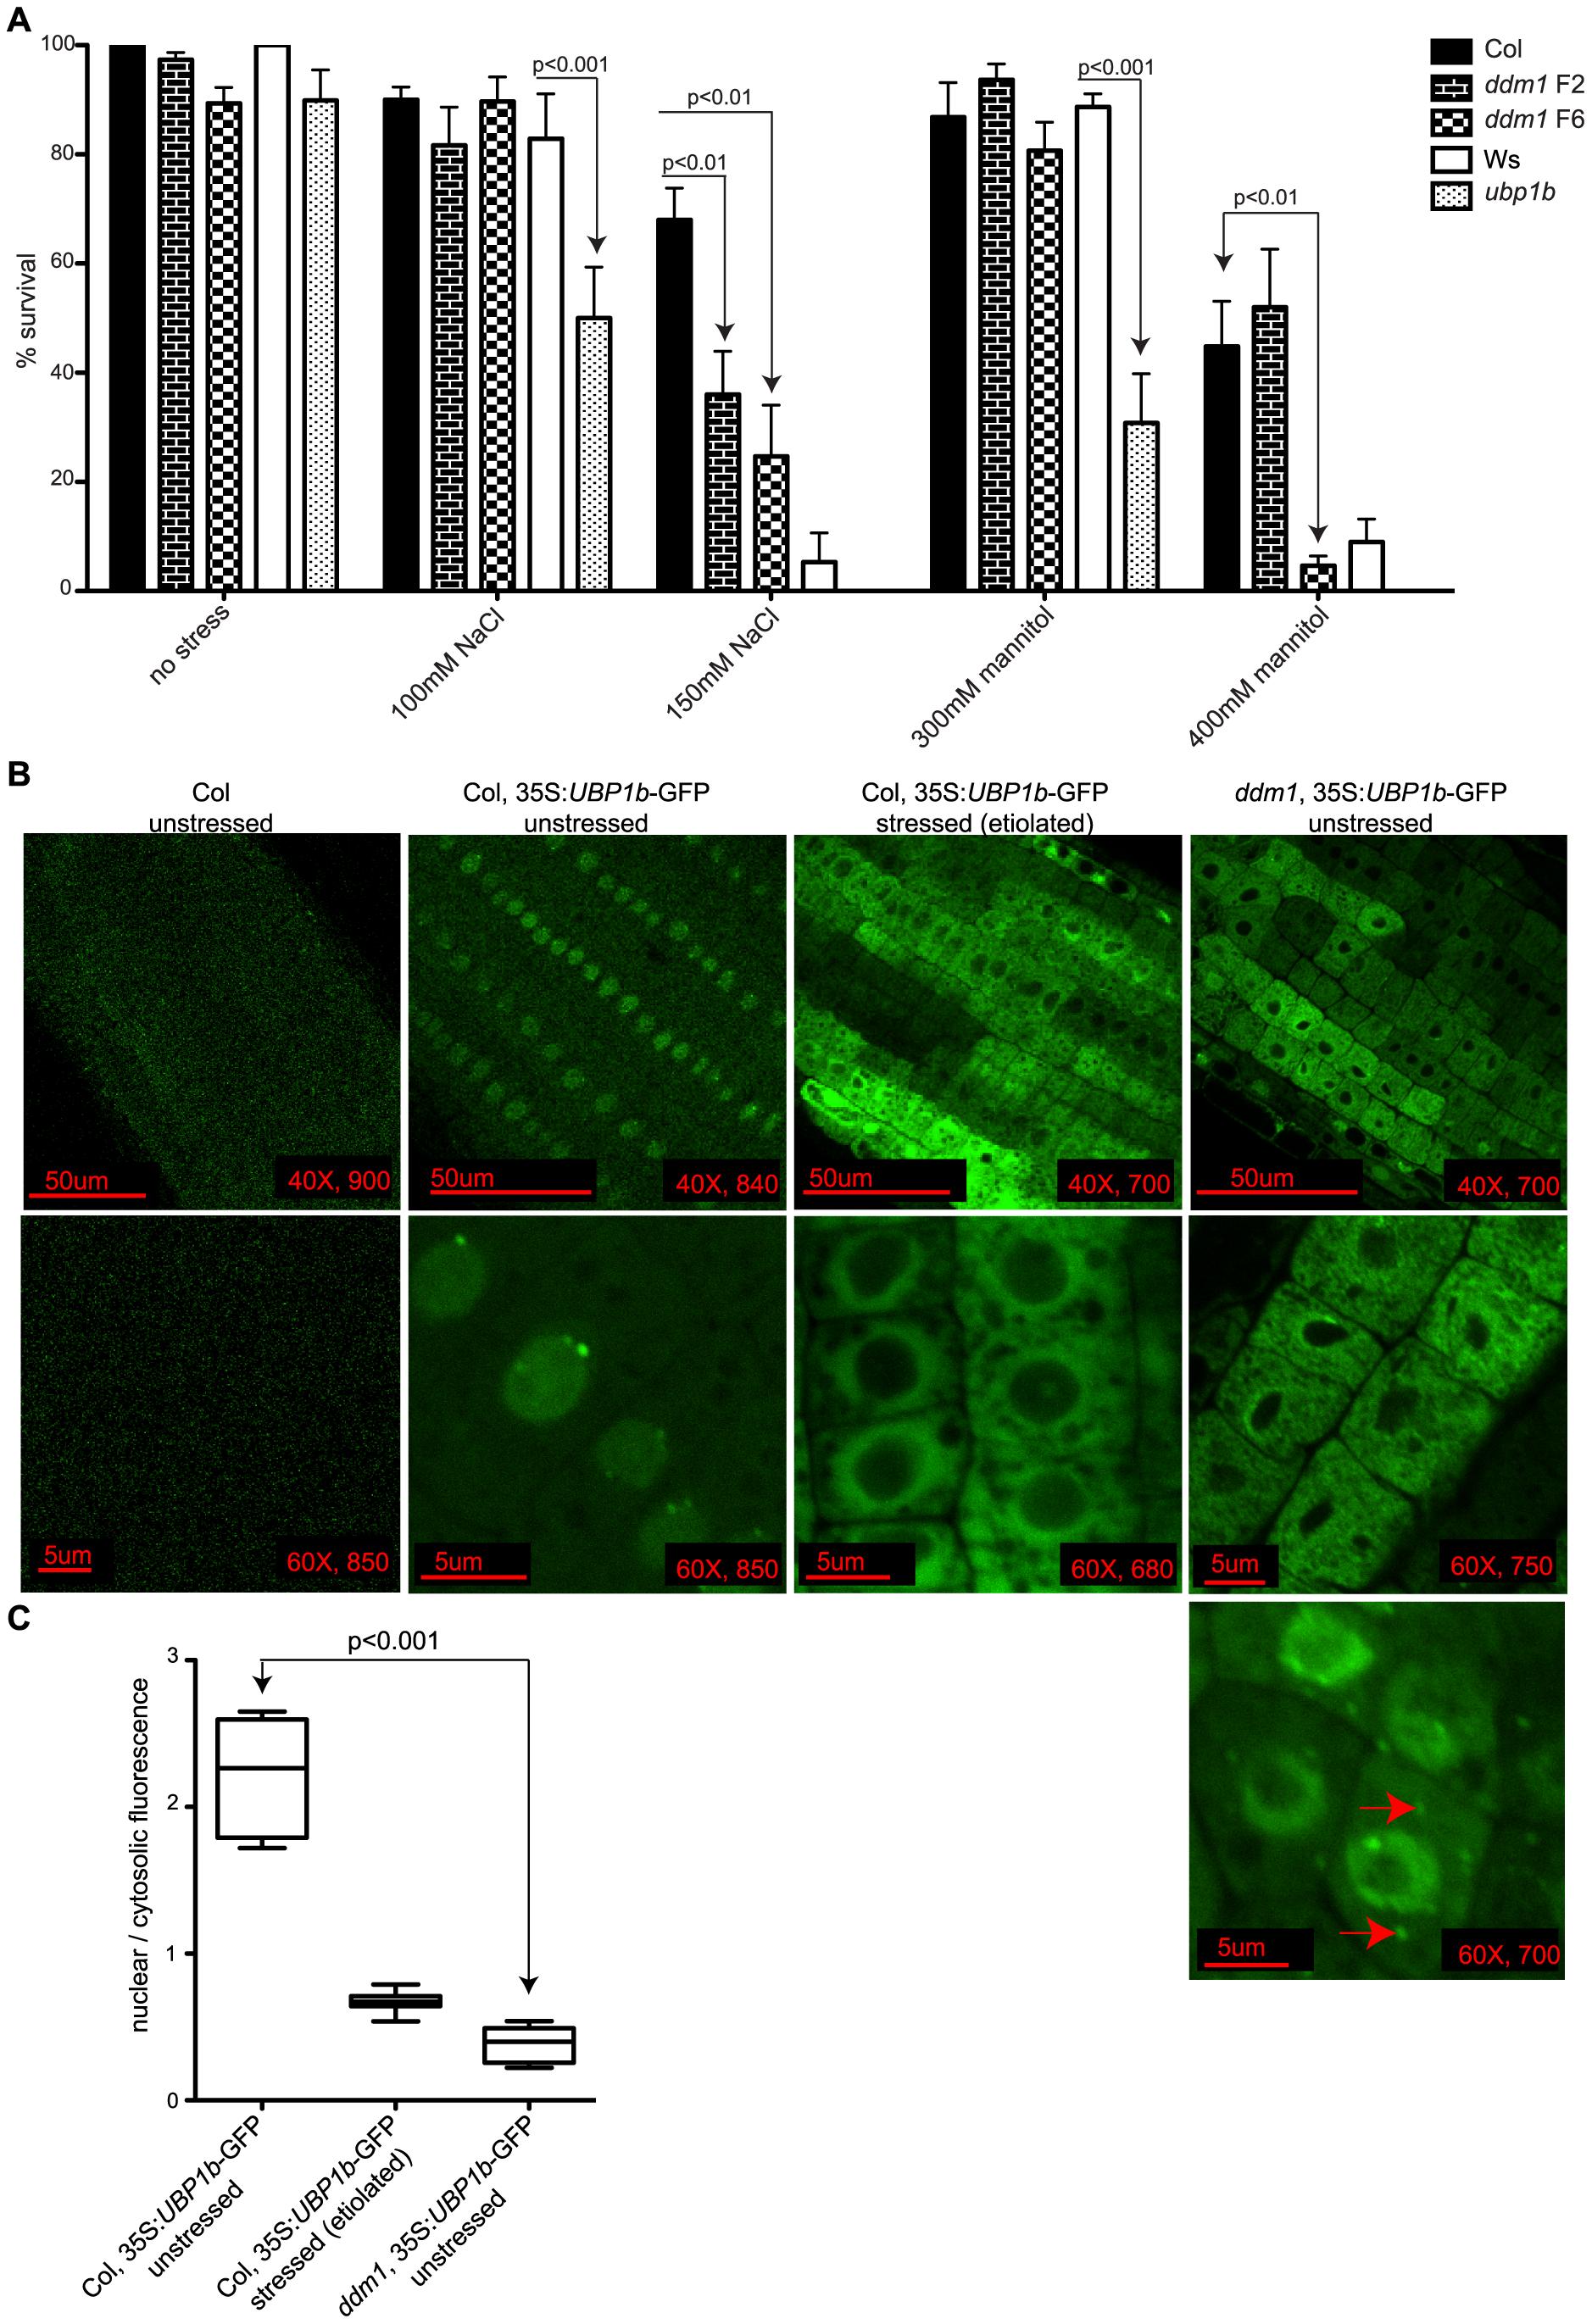 UBP1b protein localization and stress sensitivity of <i>ddm1</i>.